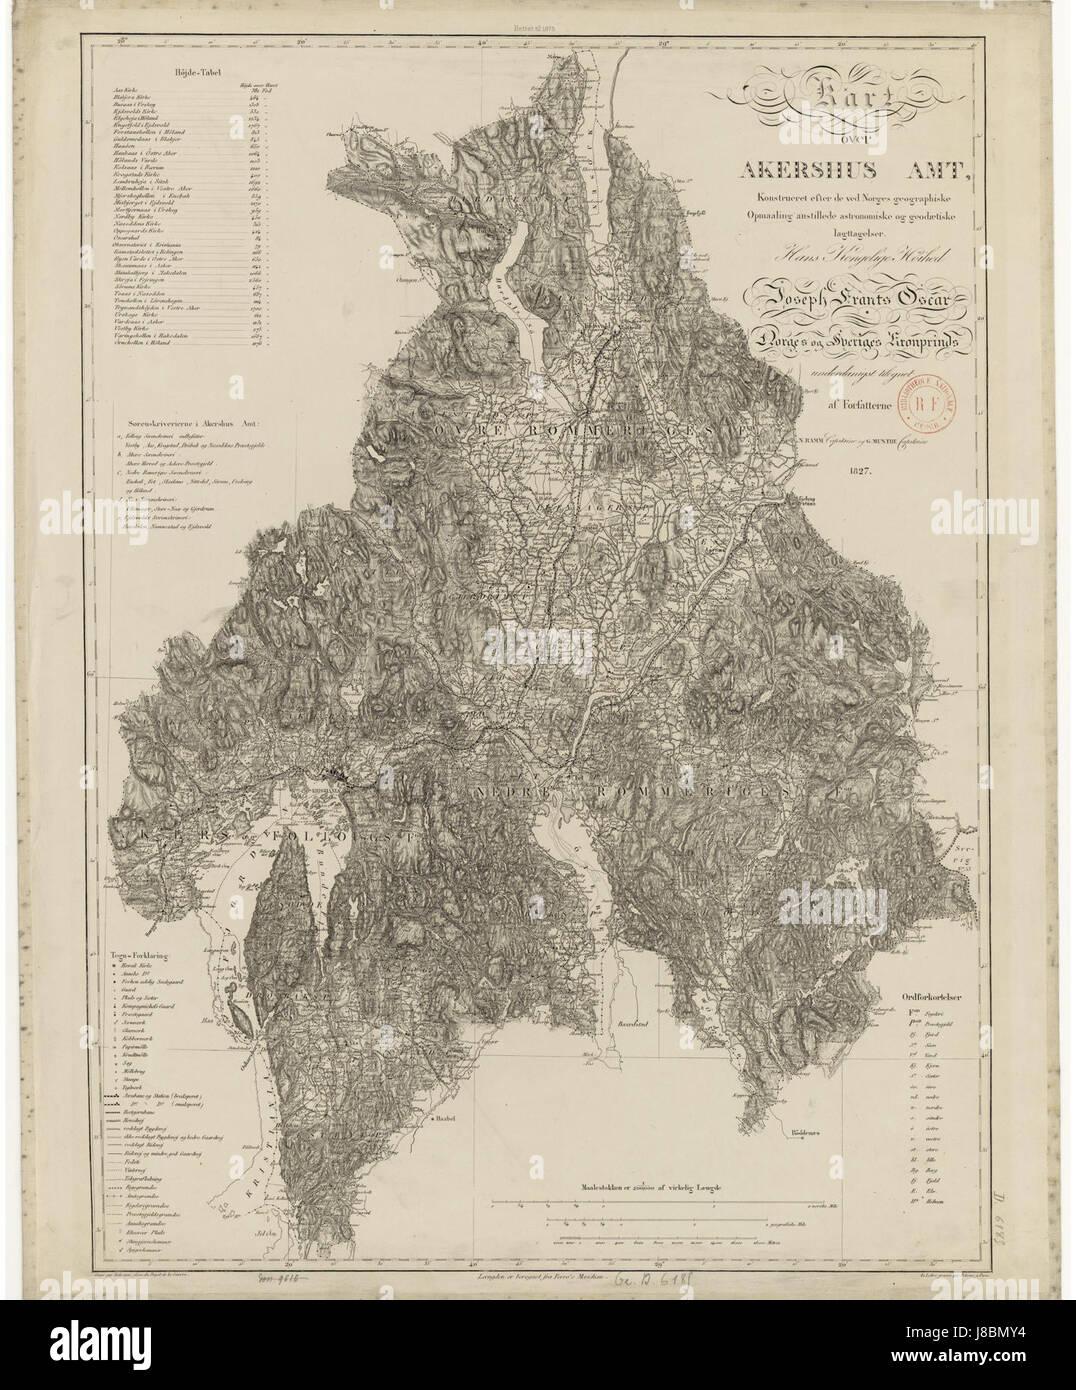 Kart Over Akershus Amt 1875 Stock Photo 142858104 Alamy